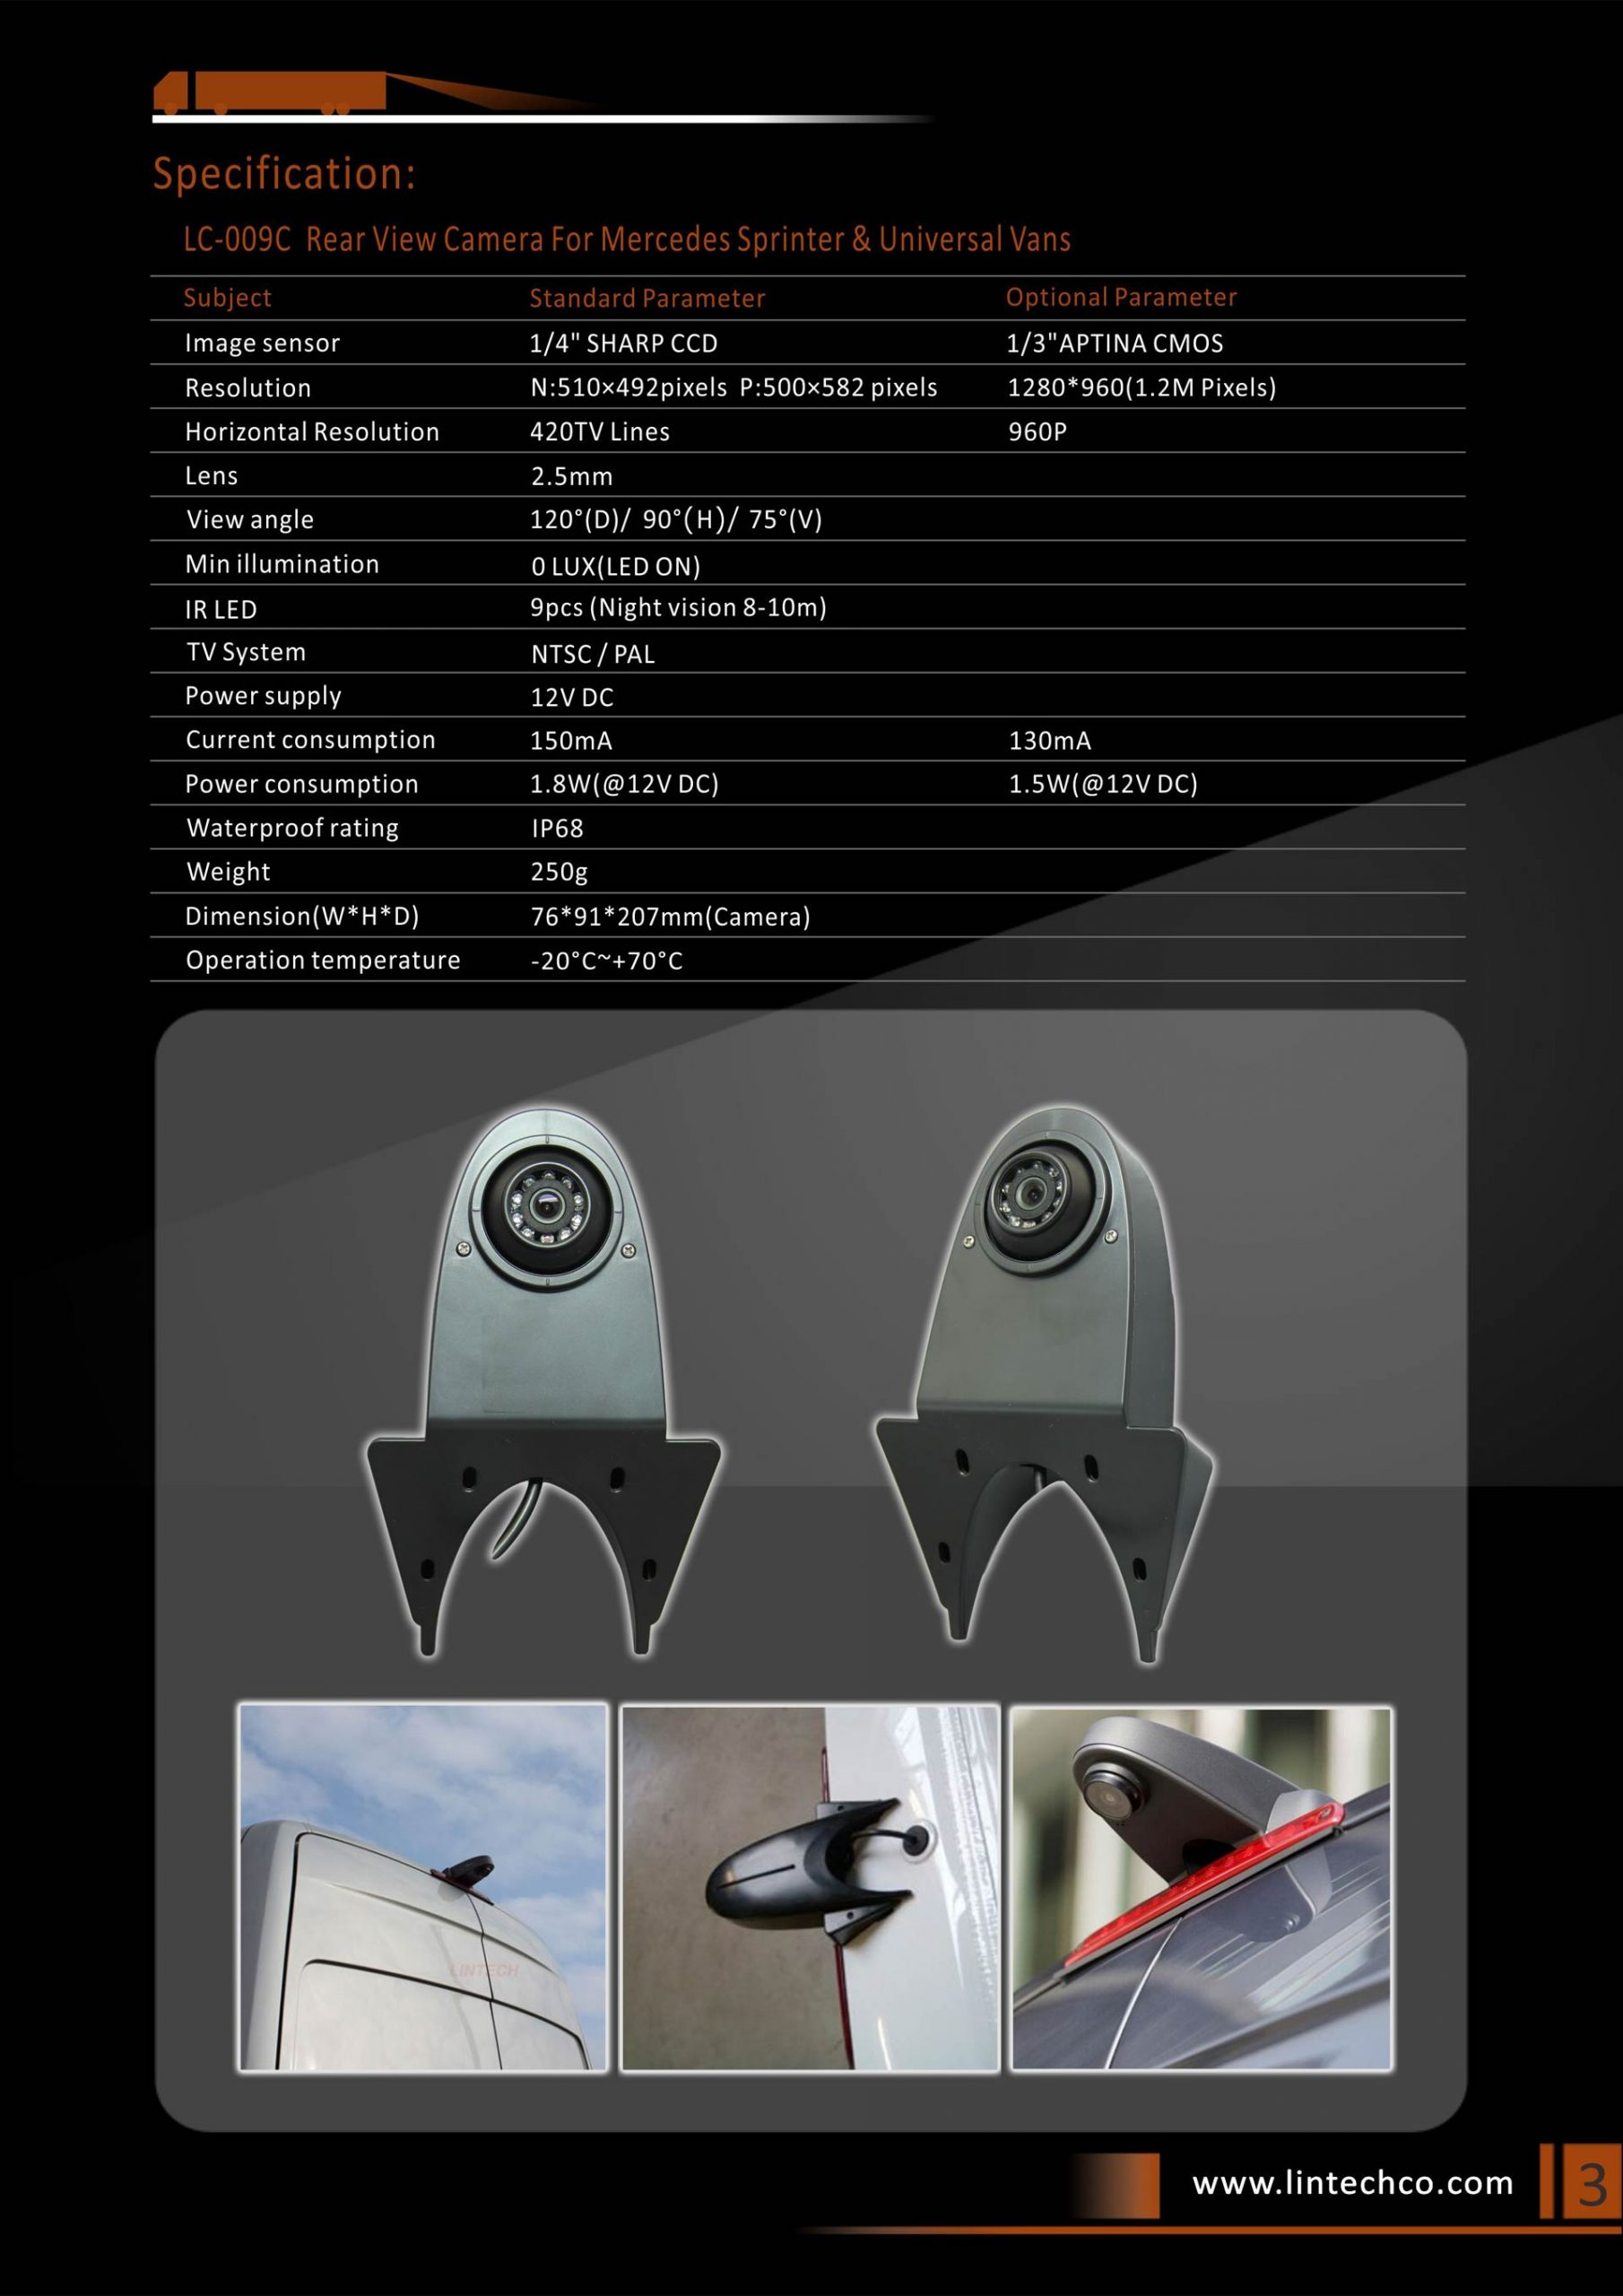 3.Rear View Camera For Mercedes Sprinter & Universal Vans